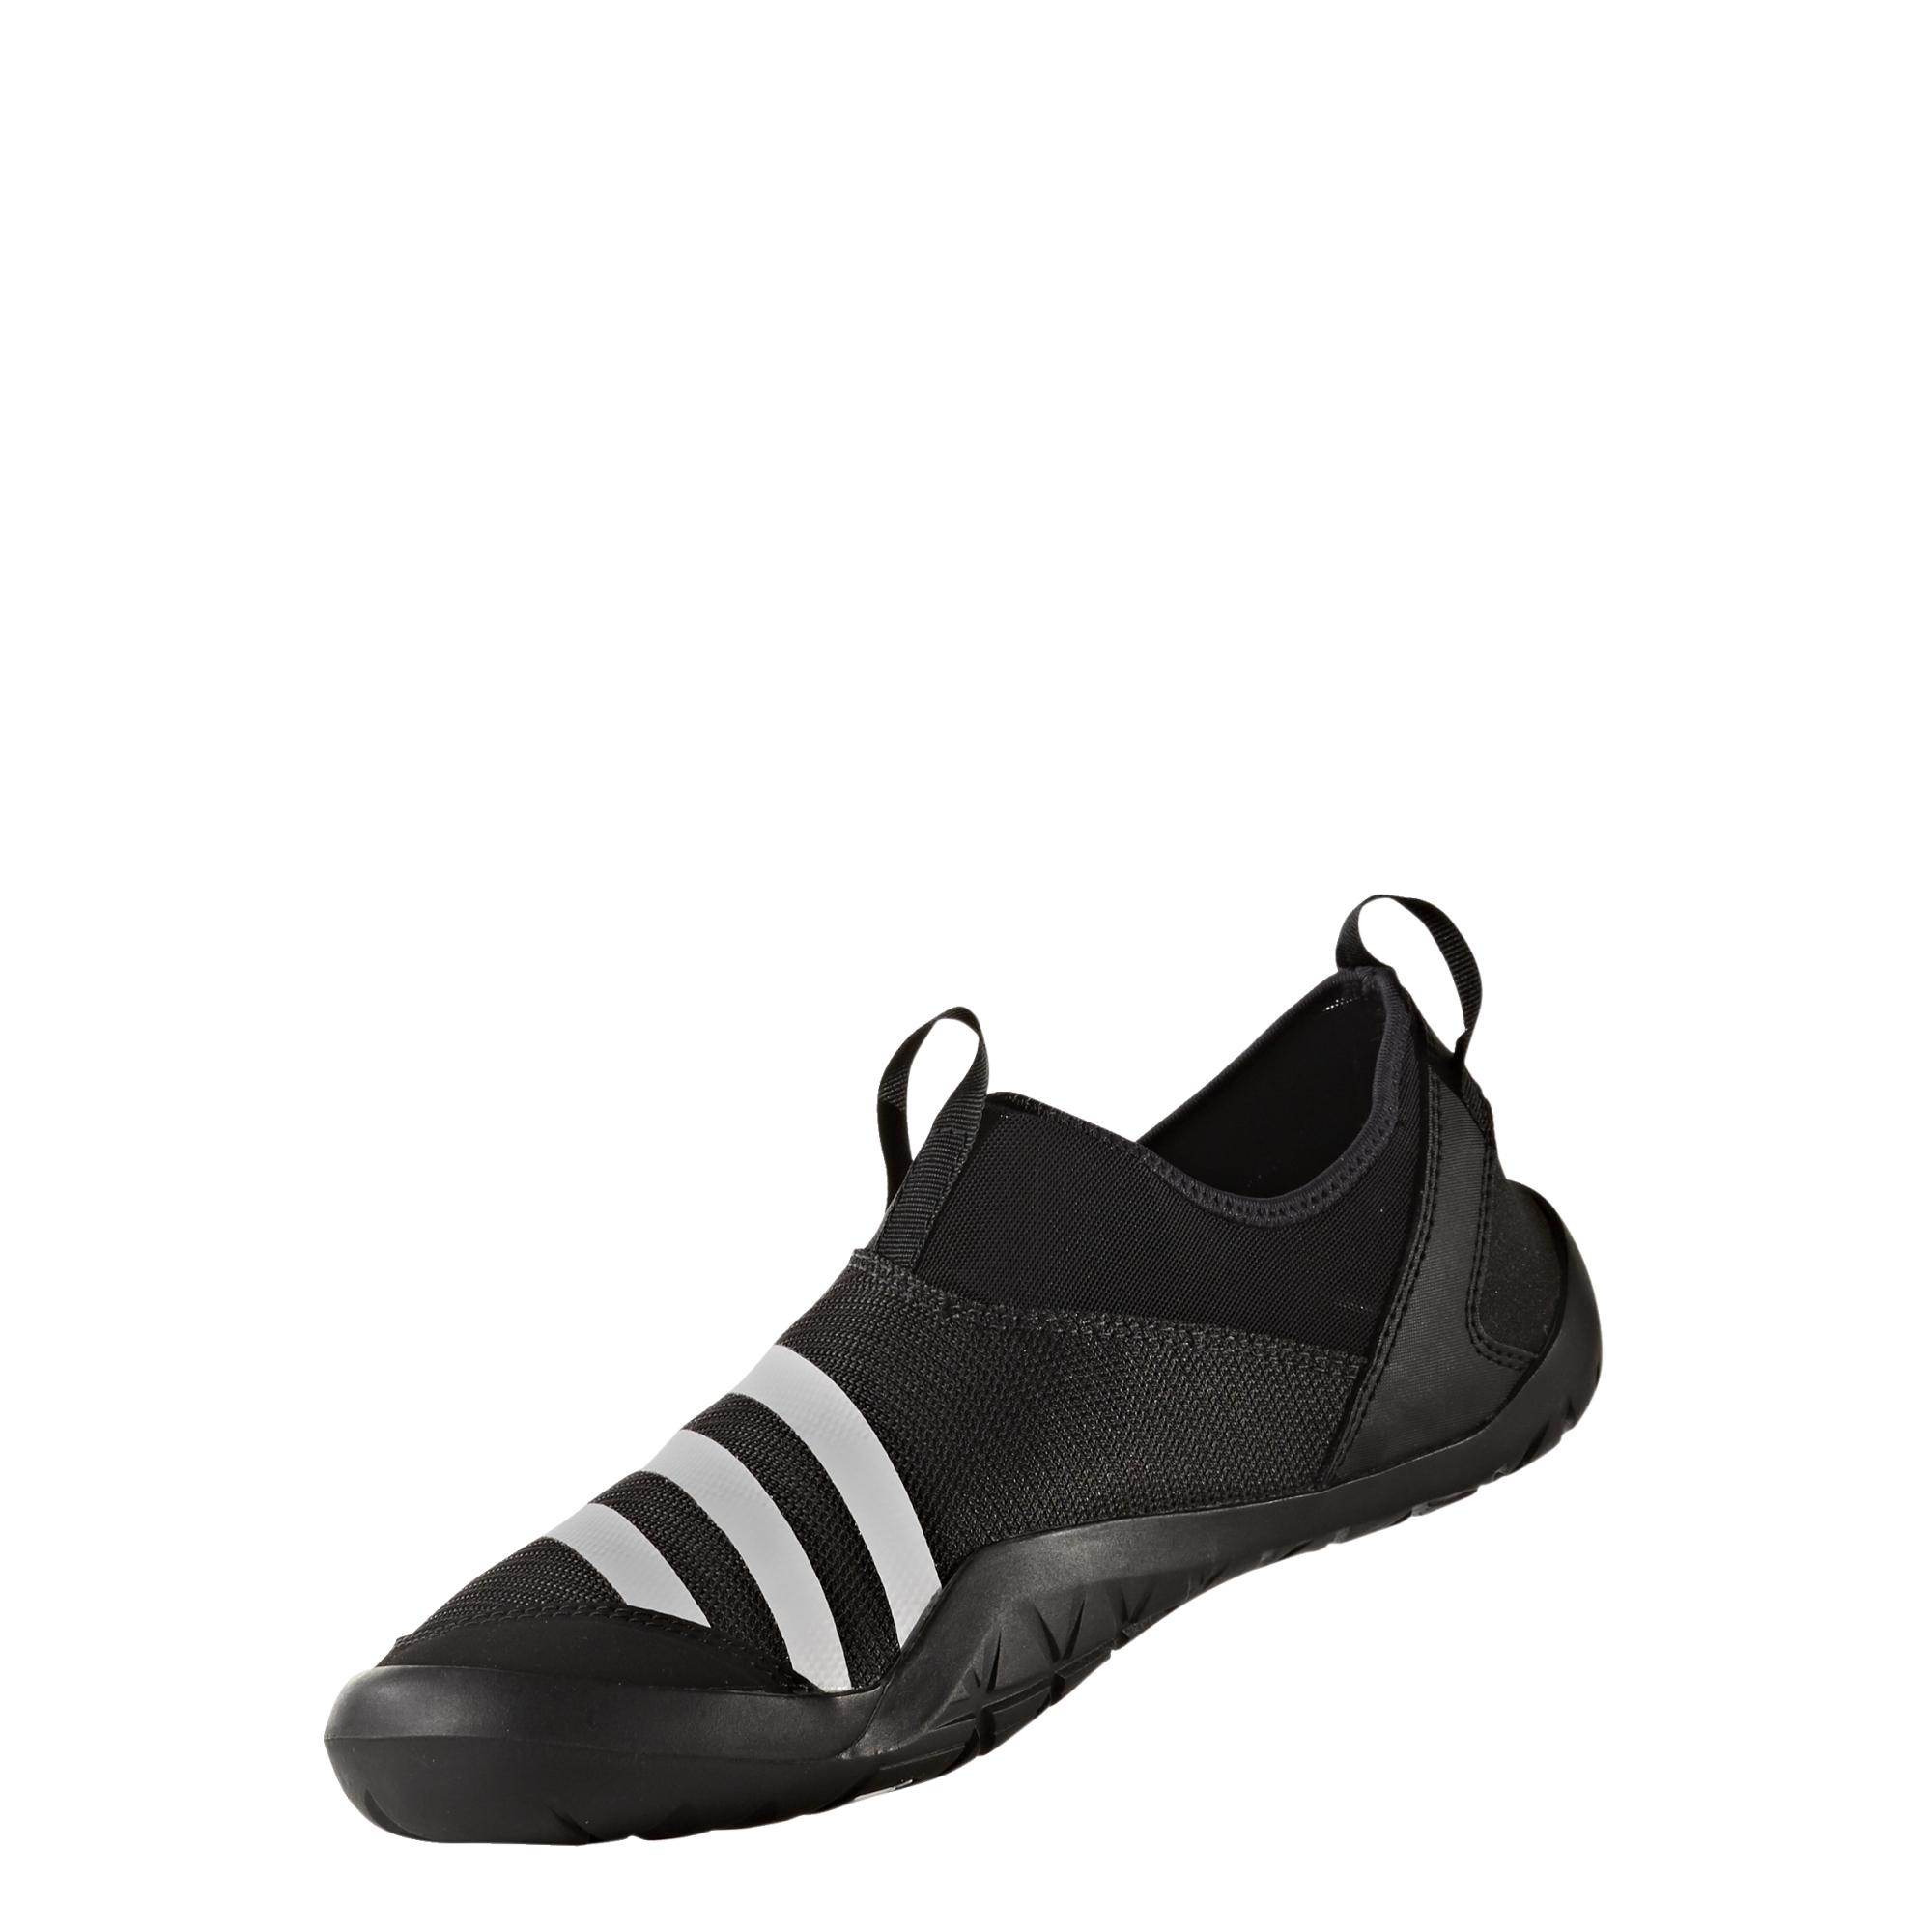 adidas Climacool Jawpaw Slip On BB5444